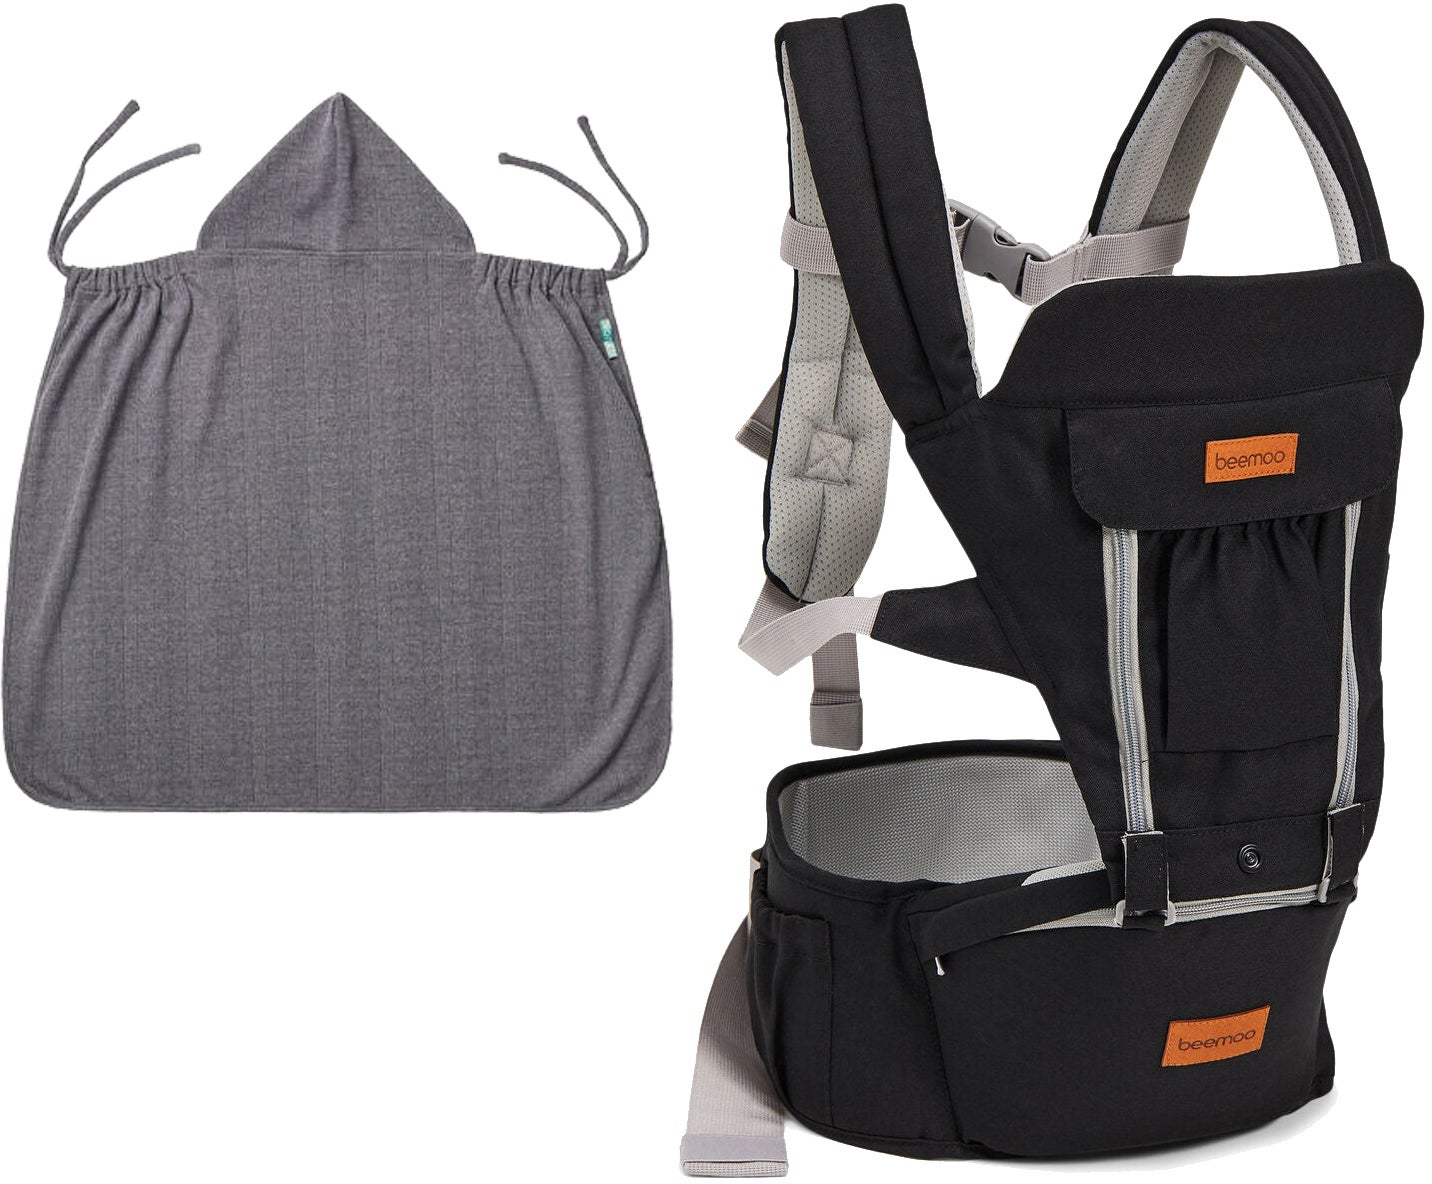 Beemoo Carry Comfort Adjust Kantoreppu + Päällinen, Black